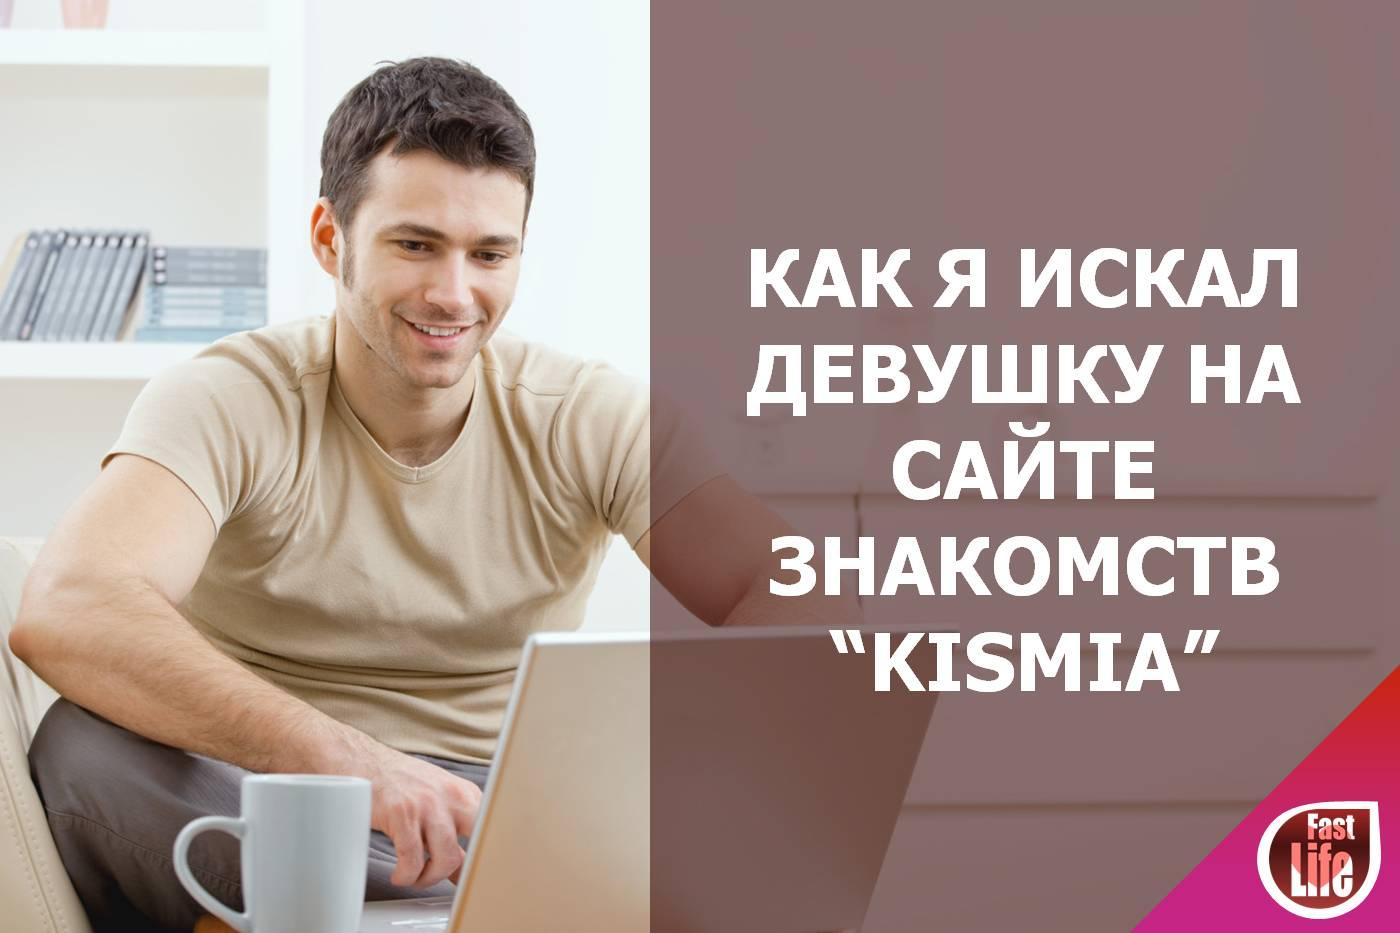 Ярославль знакомства на авито